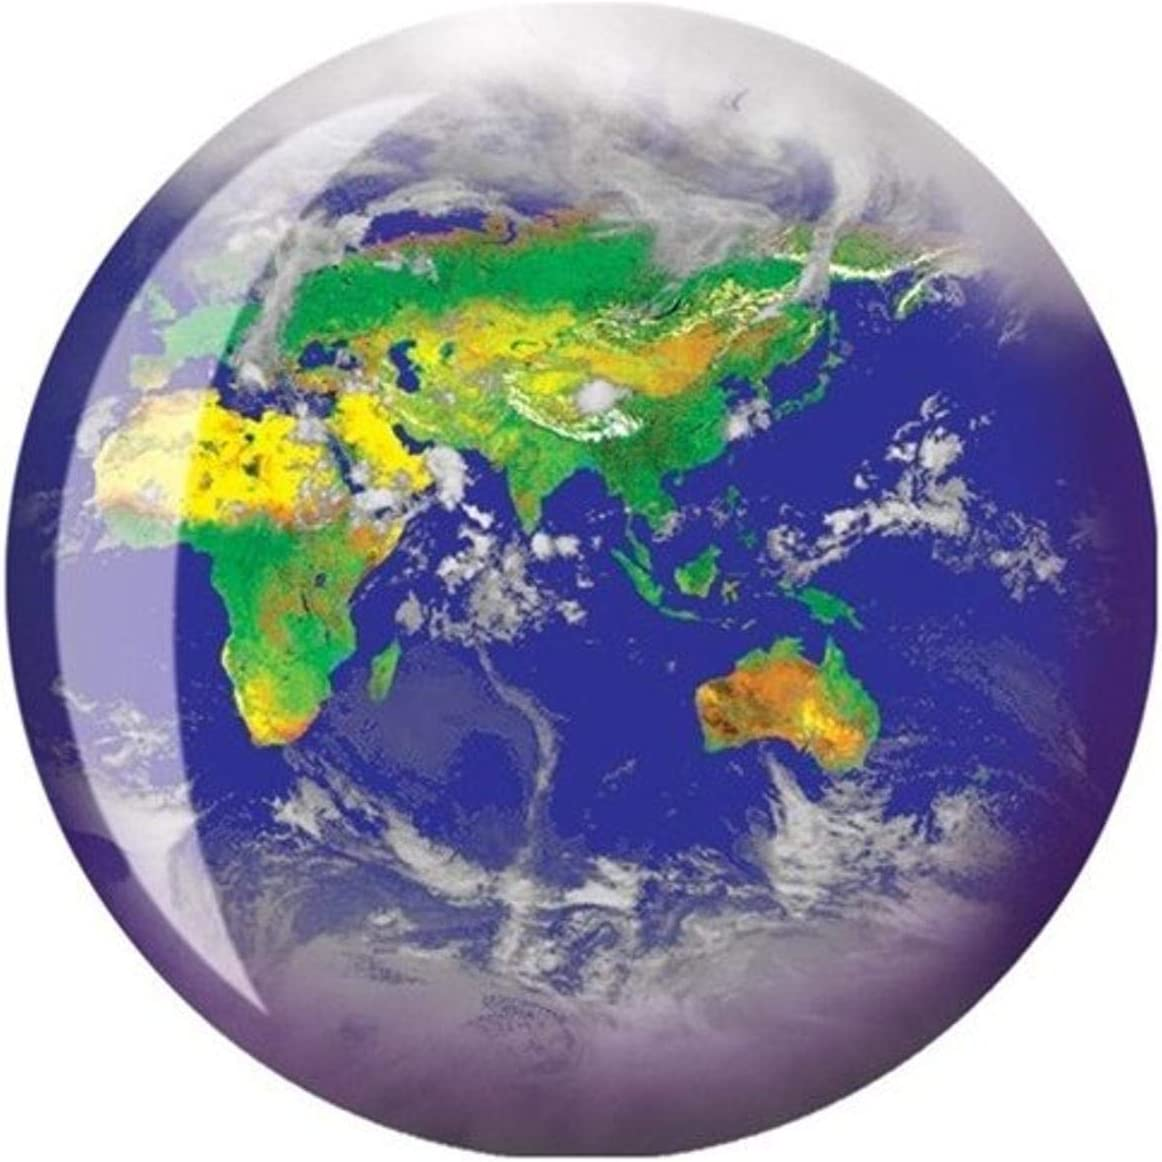 Brunswick Bowling Products World Viz-A-Ball Bowling Ball 15Lbs Blue//Green//White 15 lbs